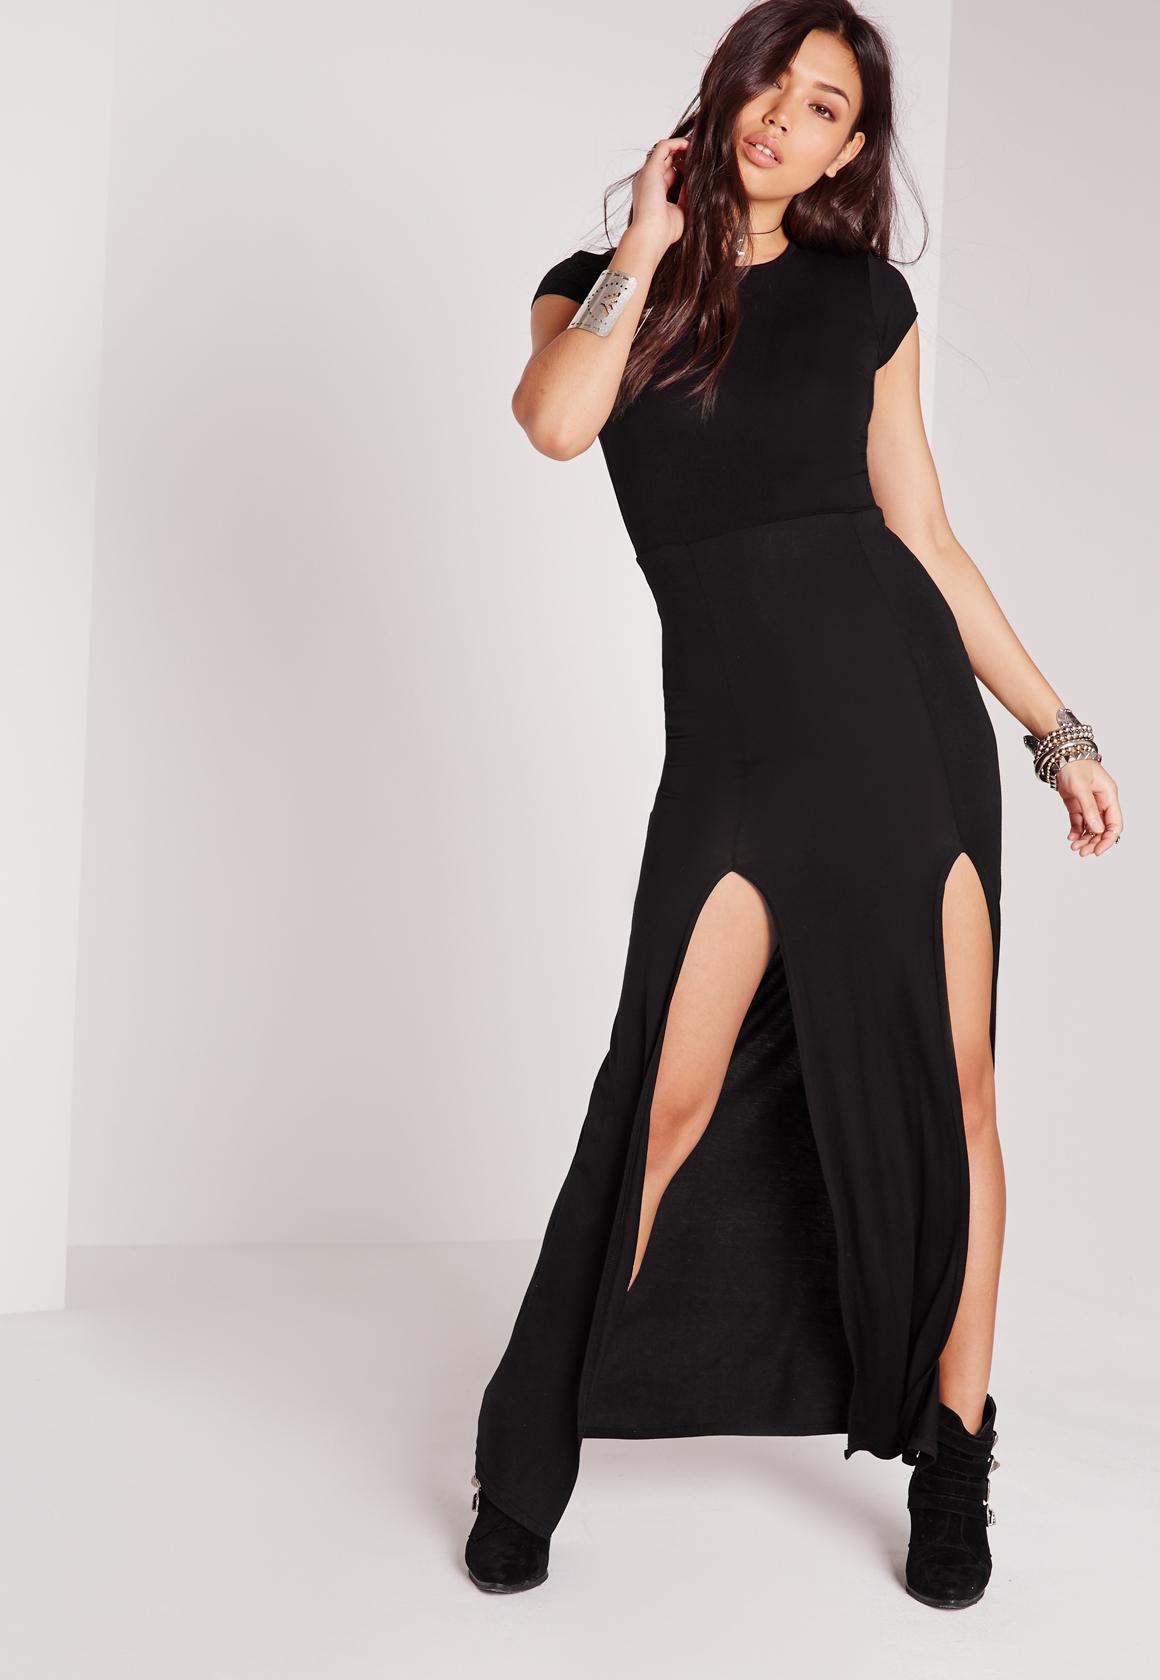 Black black t shirt maxi dress - Split Front T Shirt Maxi Dress Black